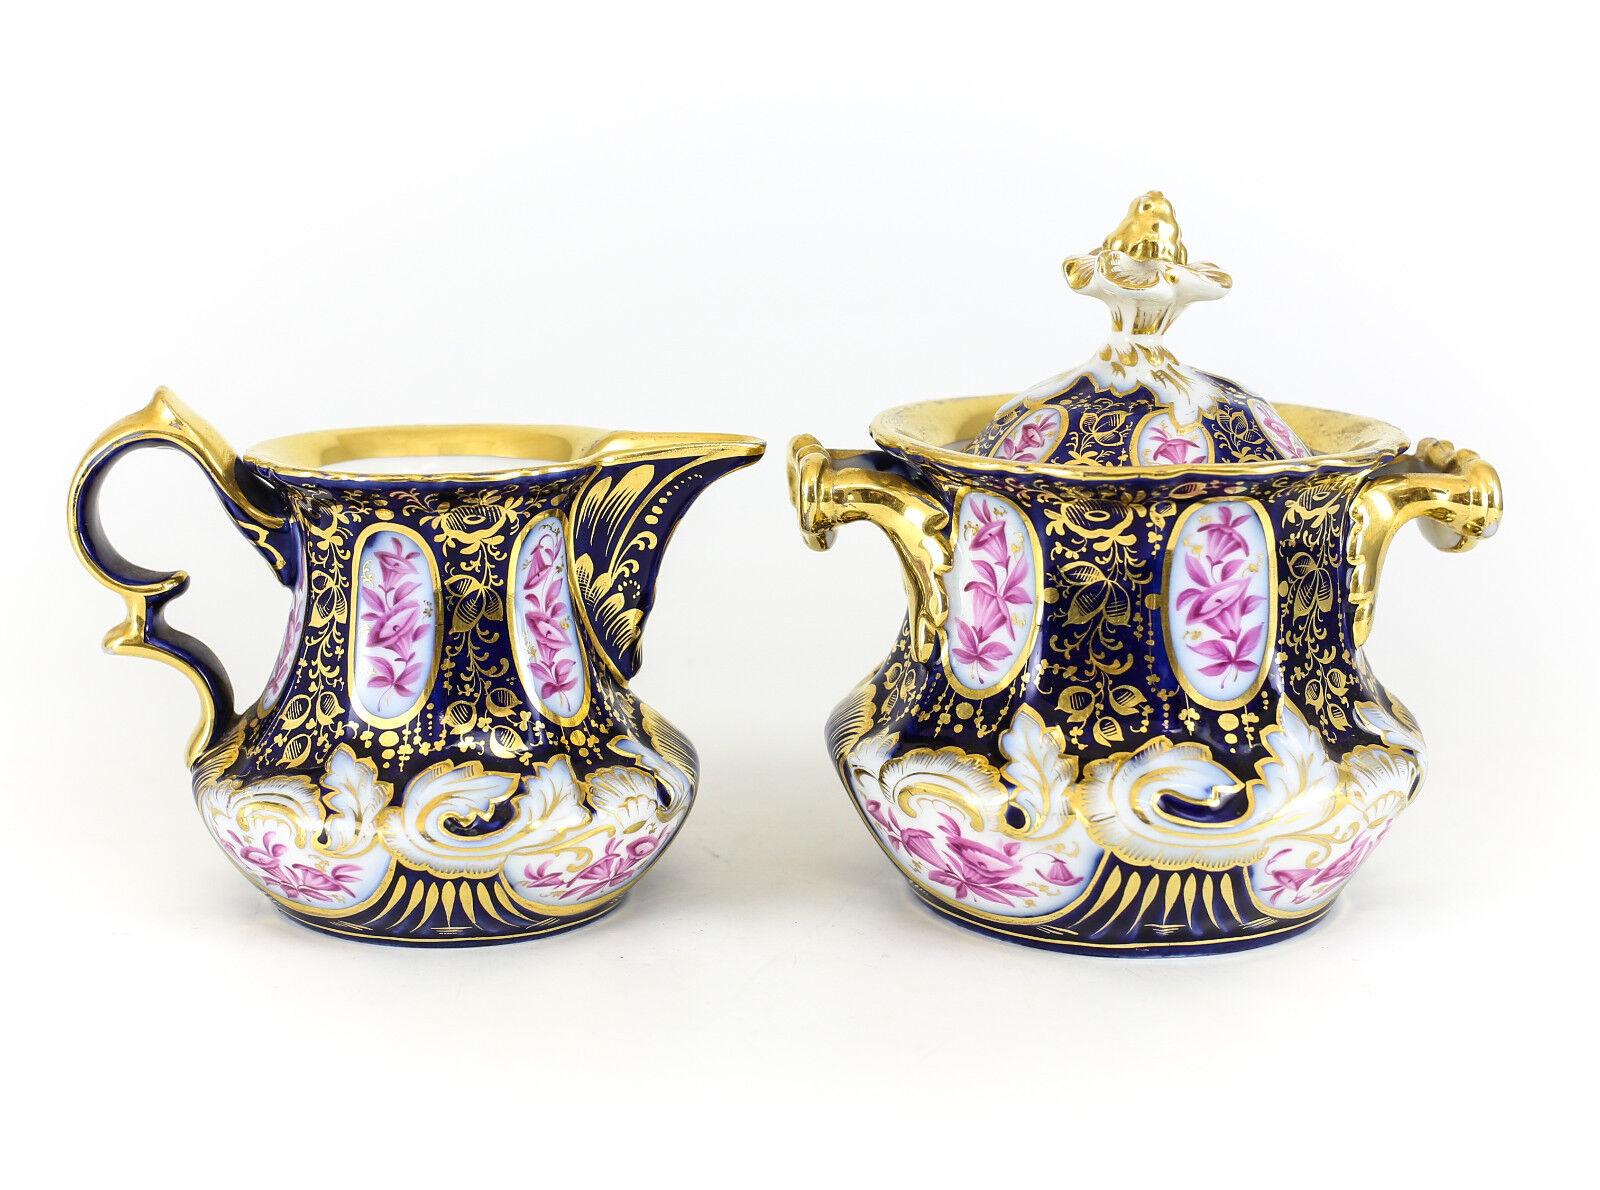 Entzuckend Pc Continental Porcelain Cream Sugar Bowl Hand Painted Gilt Th Century With  Mbel Roller Kchen